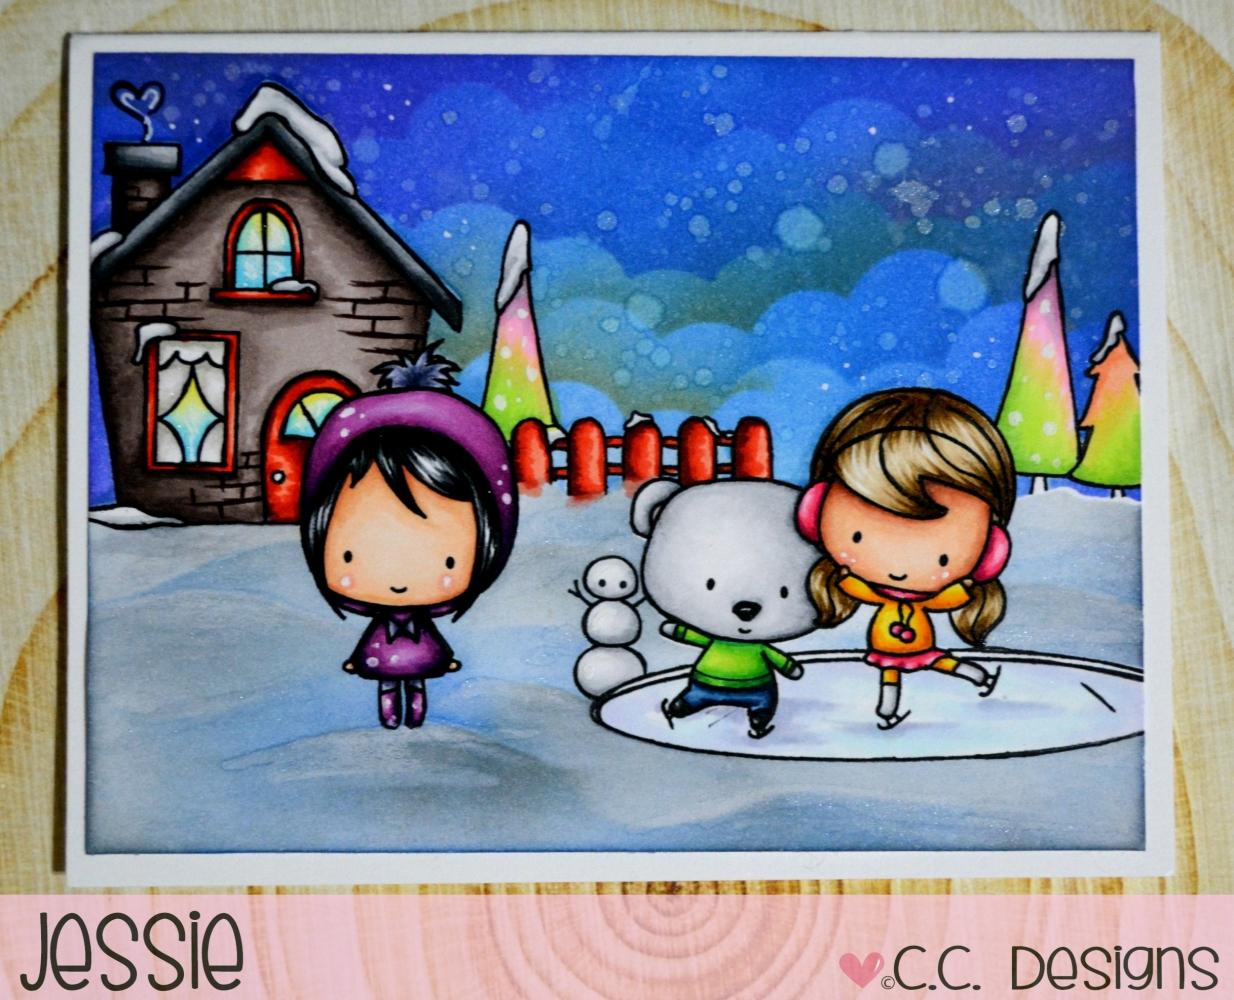 CC Designs - Winter Time - Jessie Banks.jpg